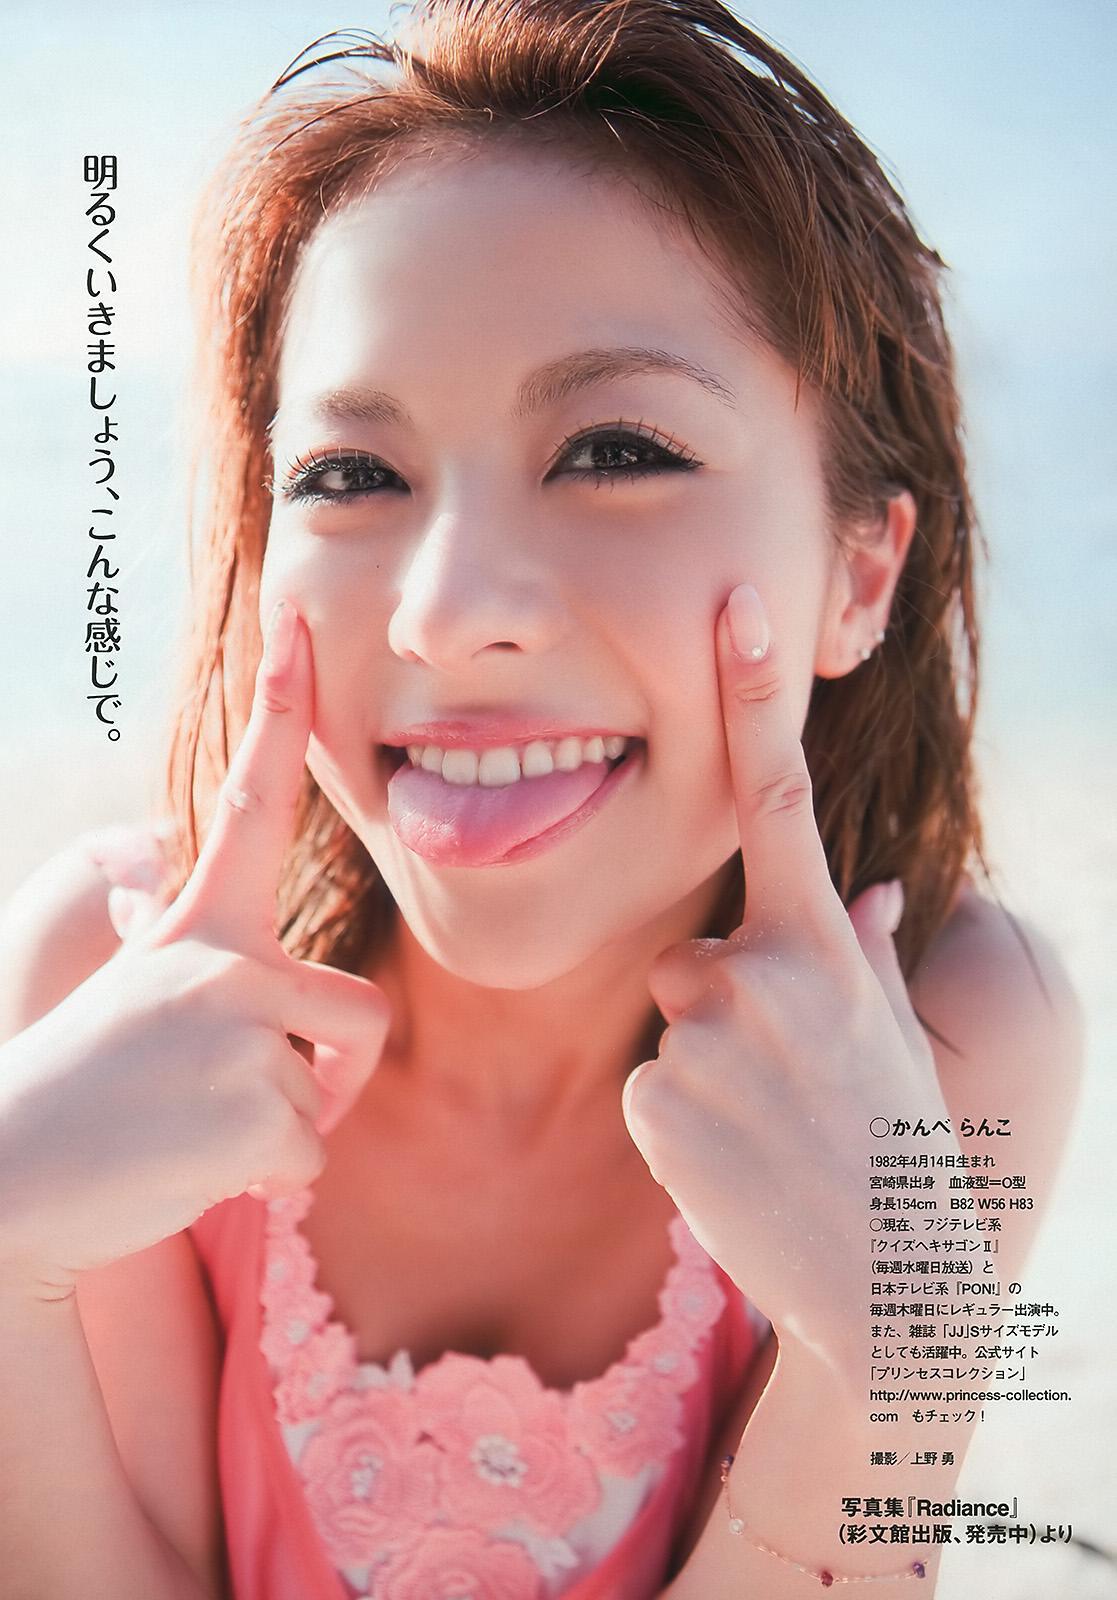 神戸蘭子の画像 p1_40